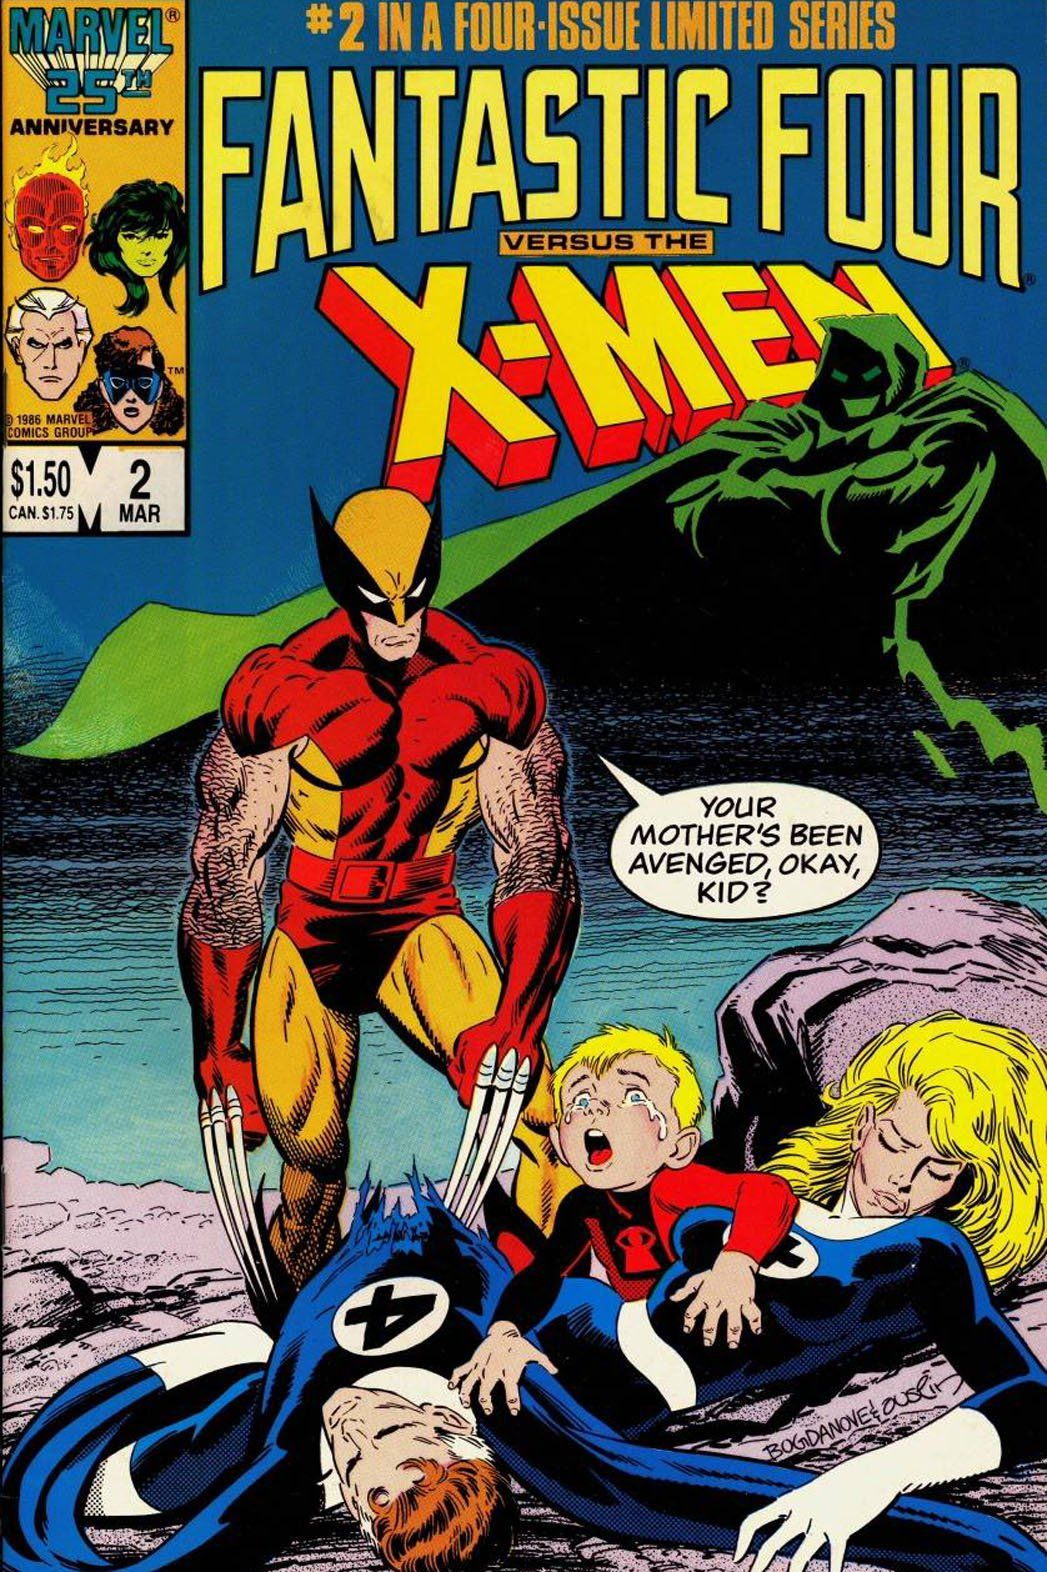 Fox Planning Fantastic Four Vs X Men Movie Update Hollywood Reporter Classic Comic Books Fantastic Four Comics Classic Comics